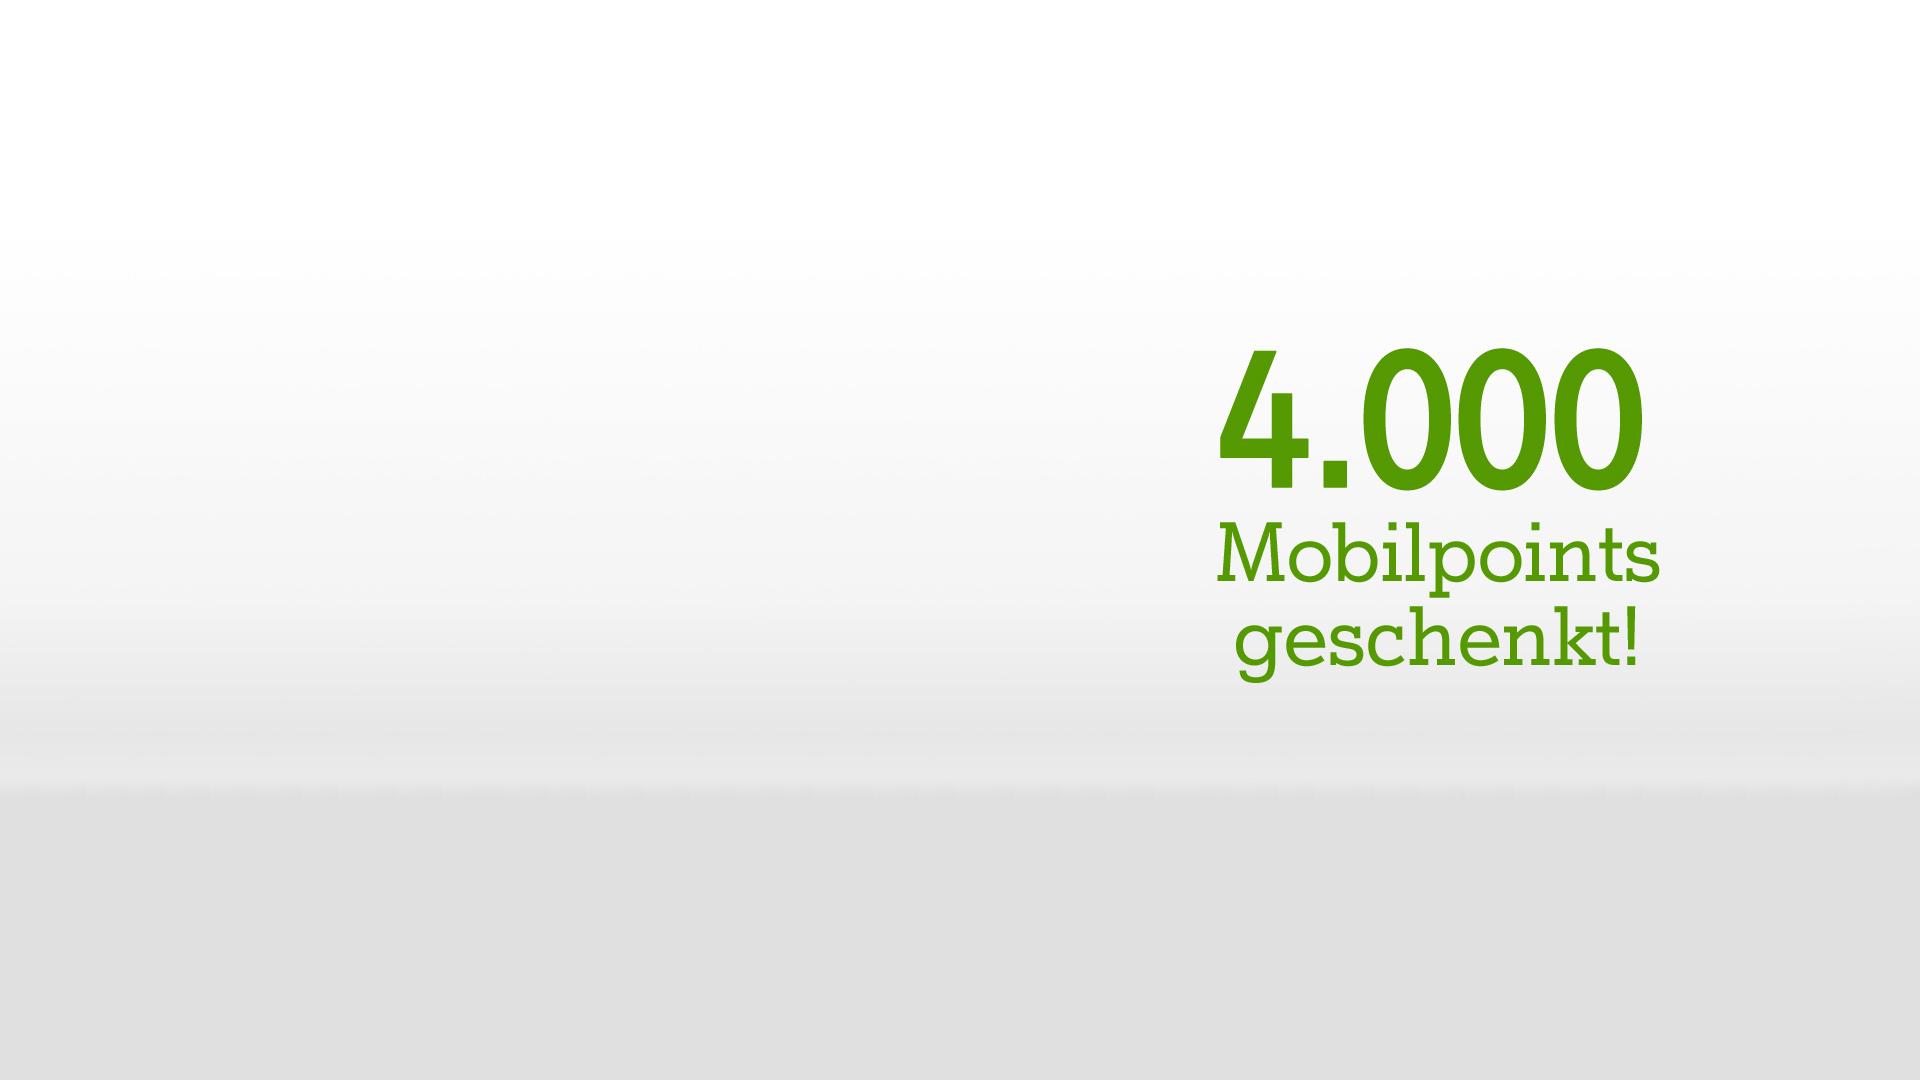 4000 Mobilpoints geschenkt